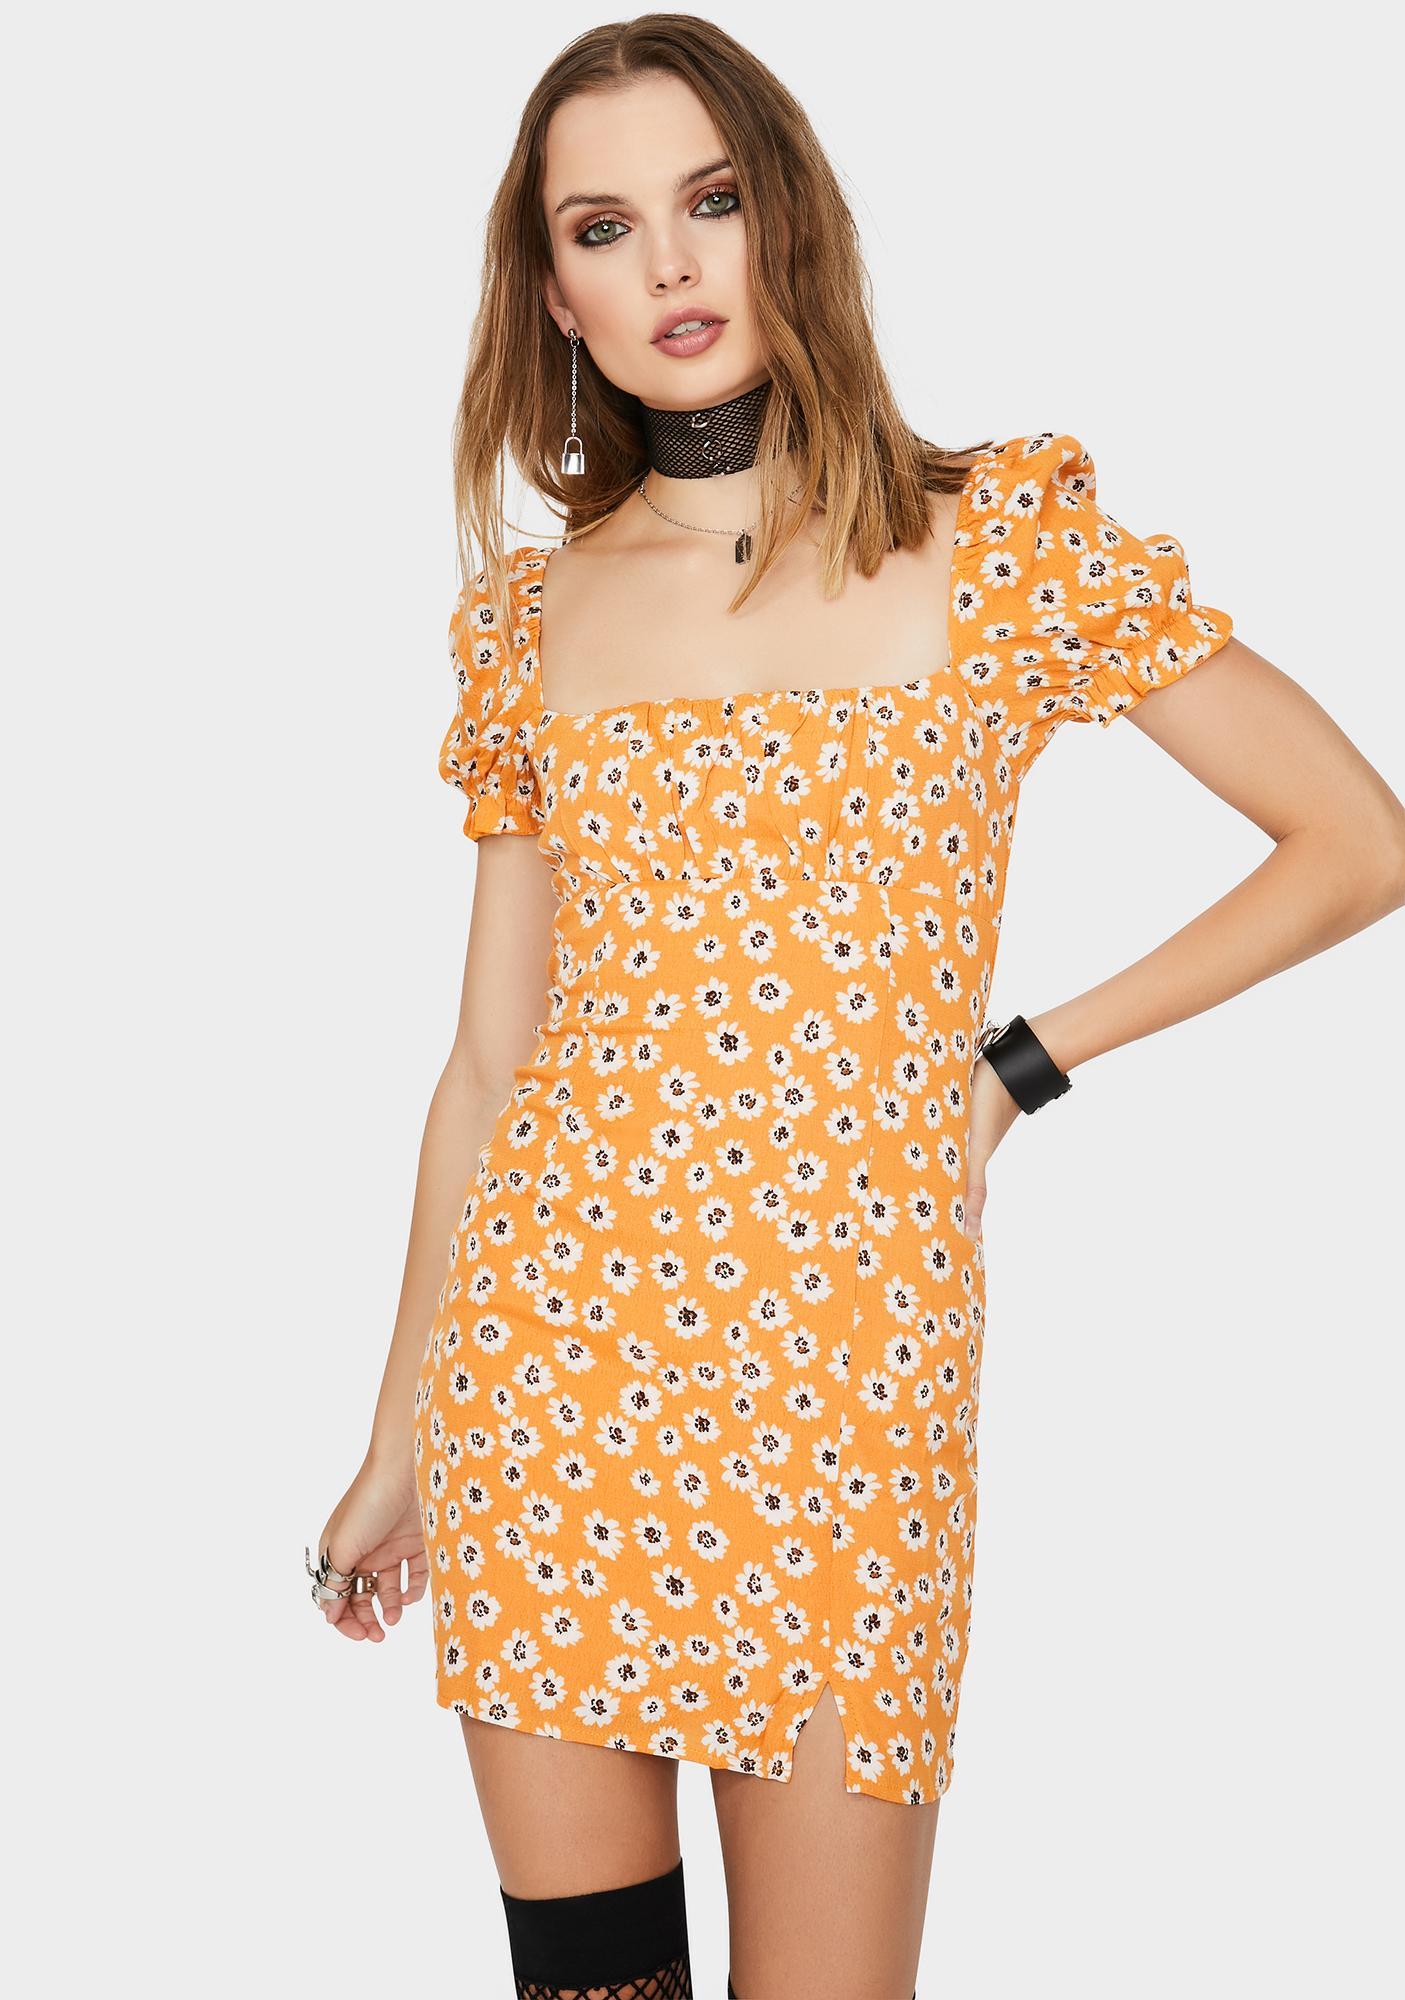 About A Girl Mini Dress